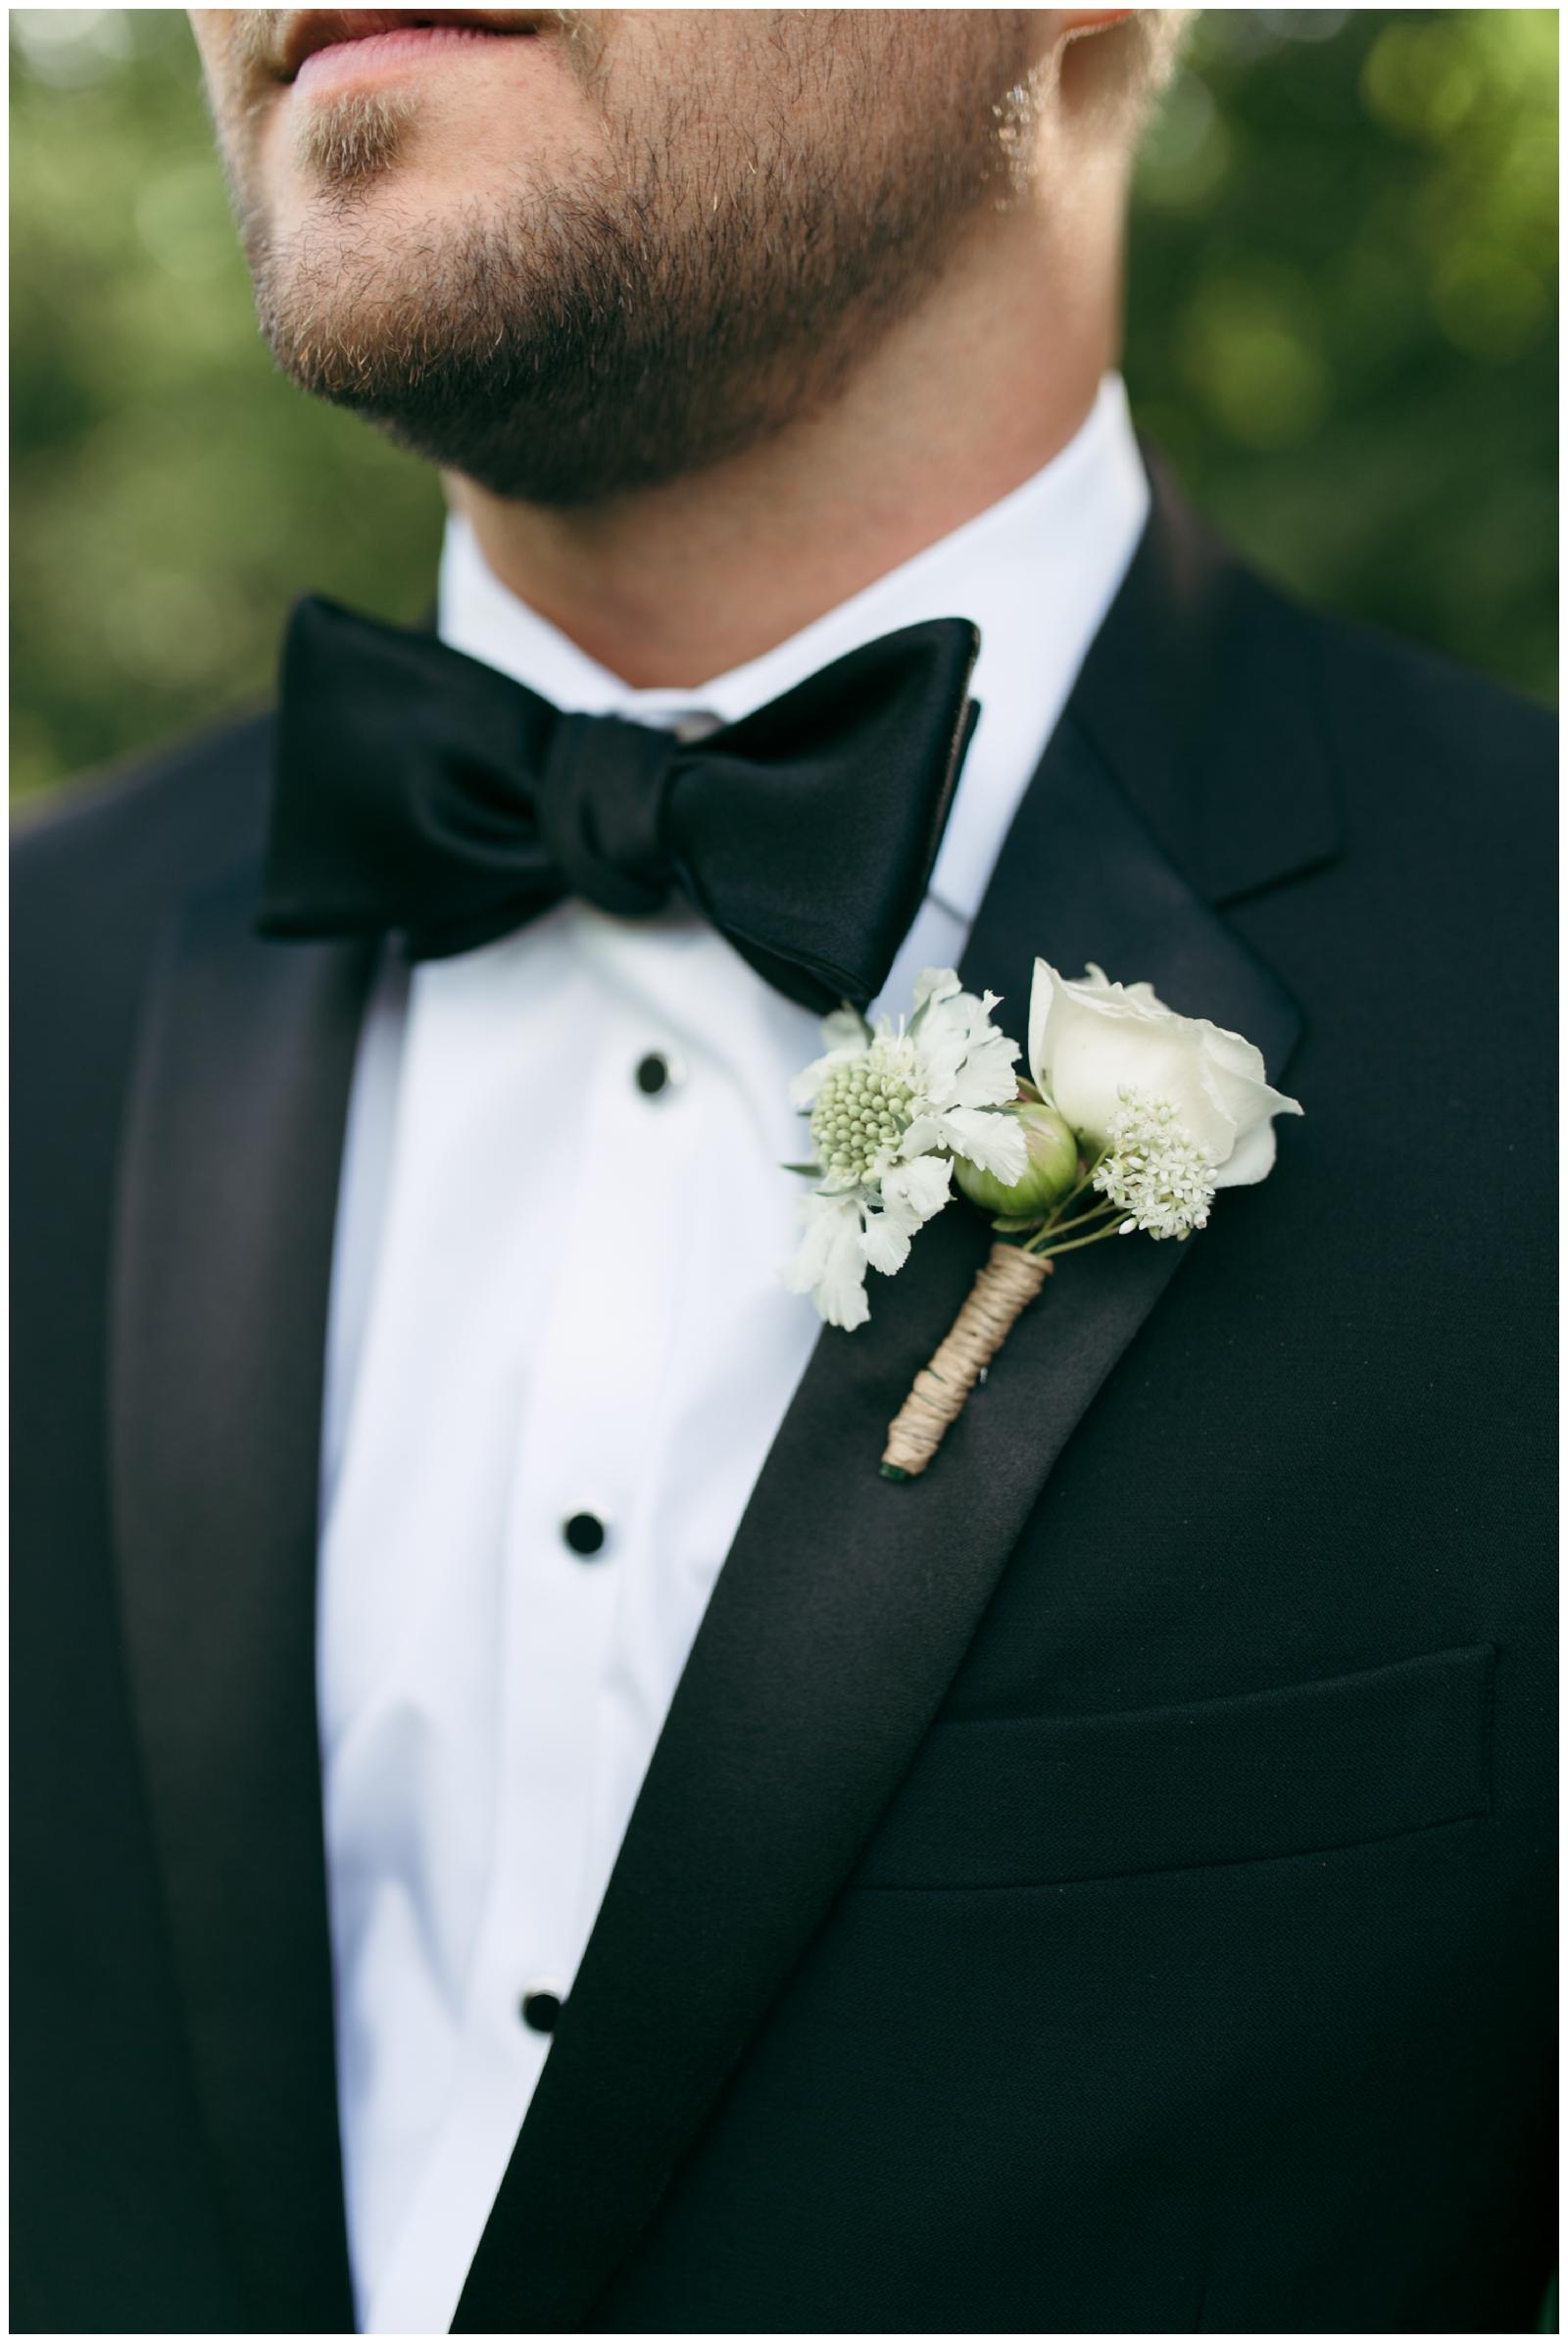 Moraine-Farm-wedding-Bailey-Q-Photo-Massachusetts-wedding-photpgrapher-041.jpg